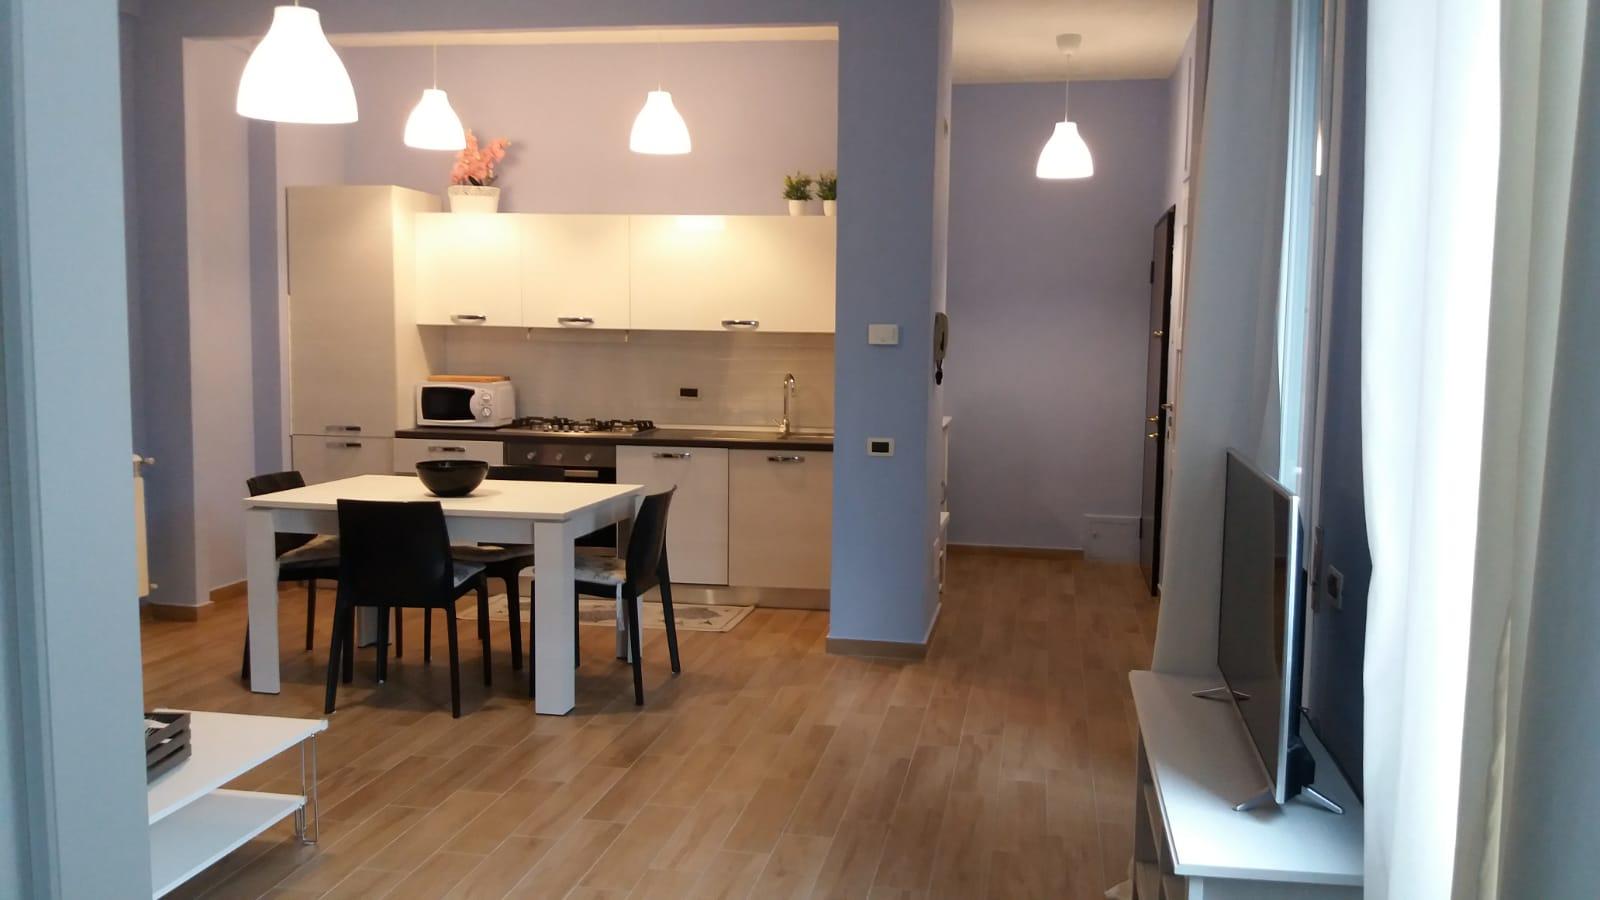 25779_Viareggio centro_Viareggio_Vendita_Appartamento